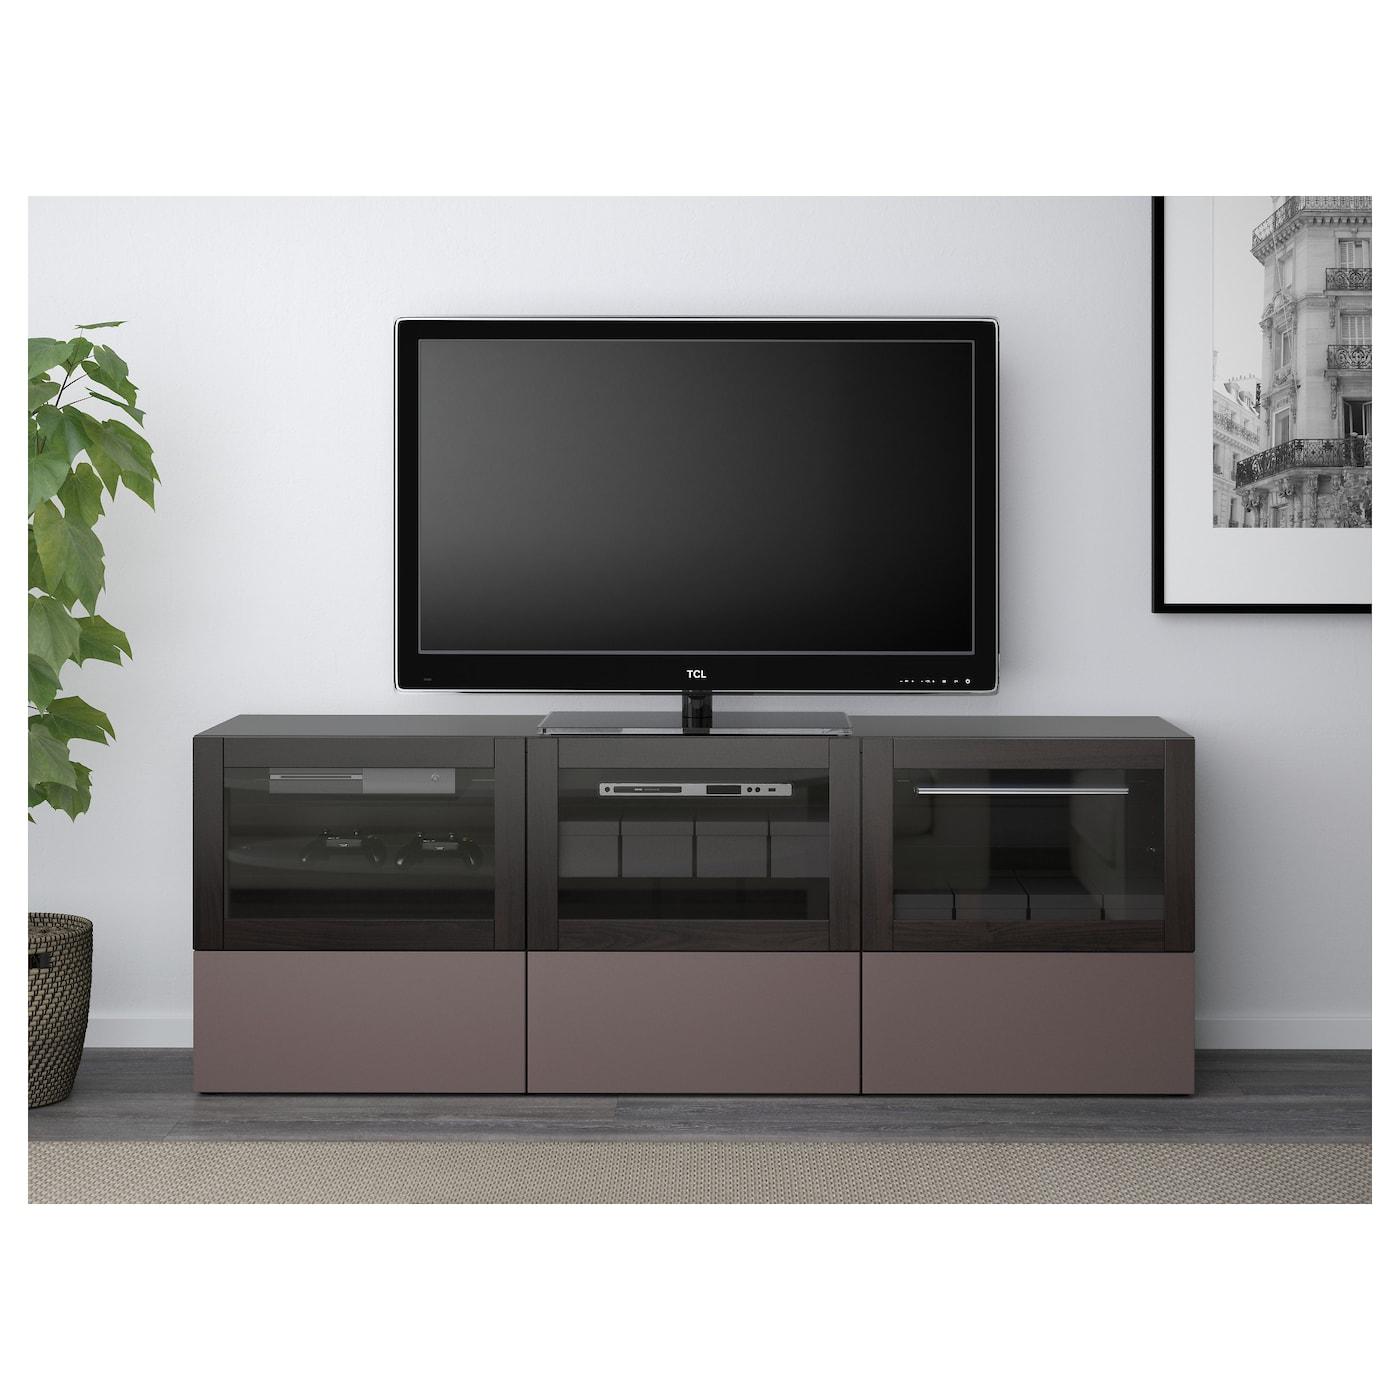 BEST… TV bench with doors and drawers Black brown valviken dark